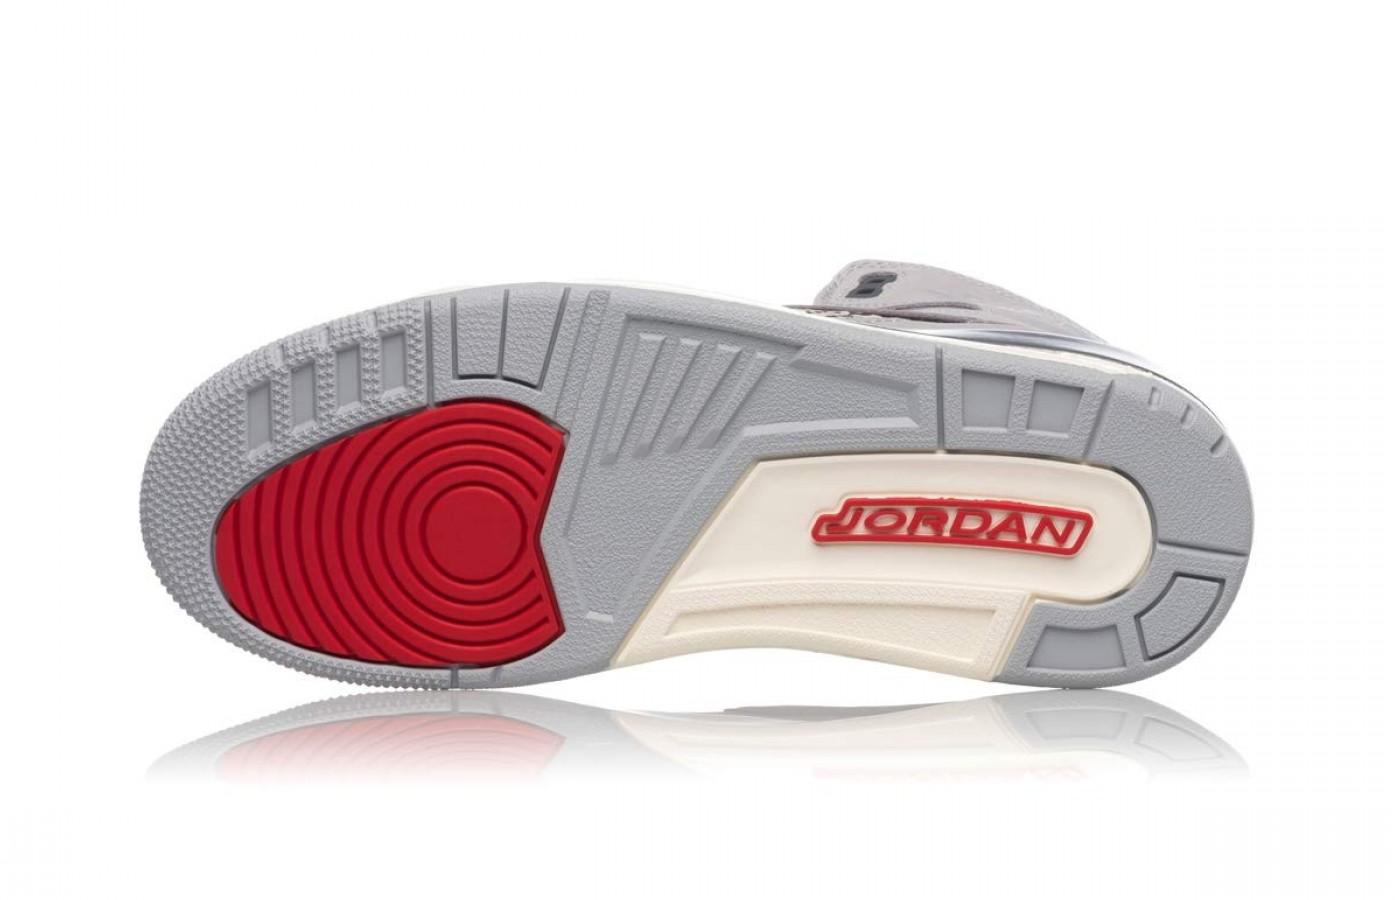 Jordan Nike Air Legacy 312 sole